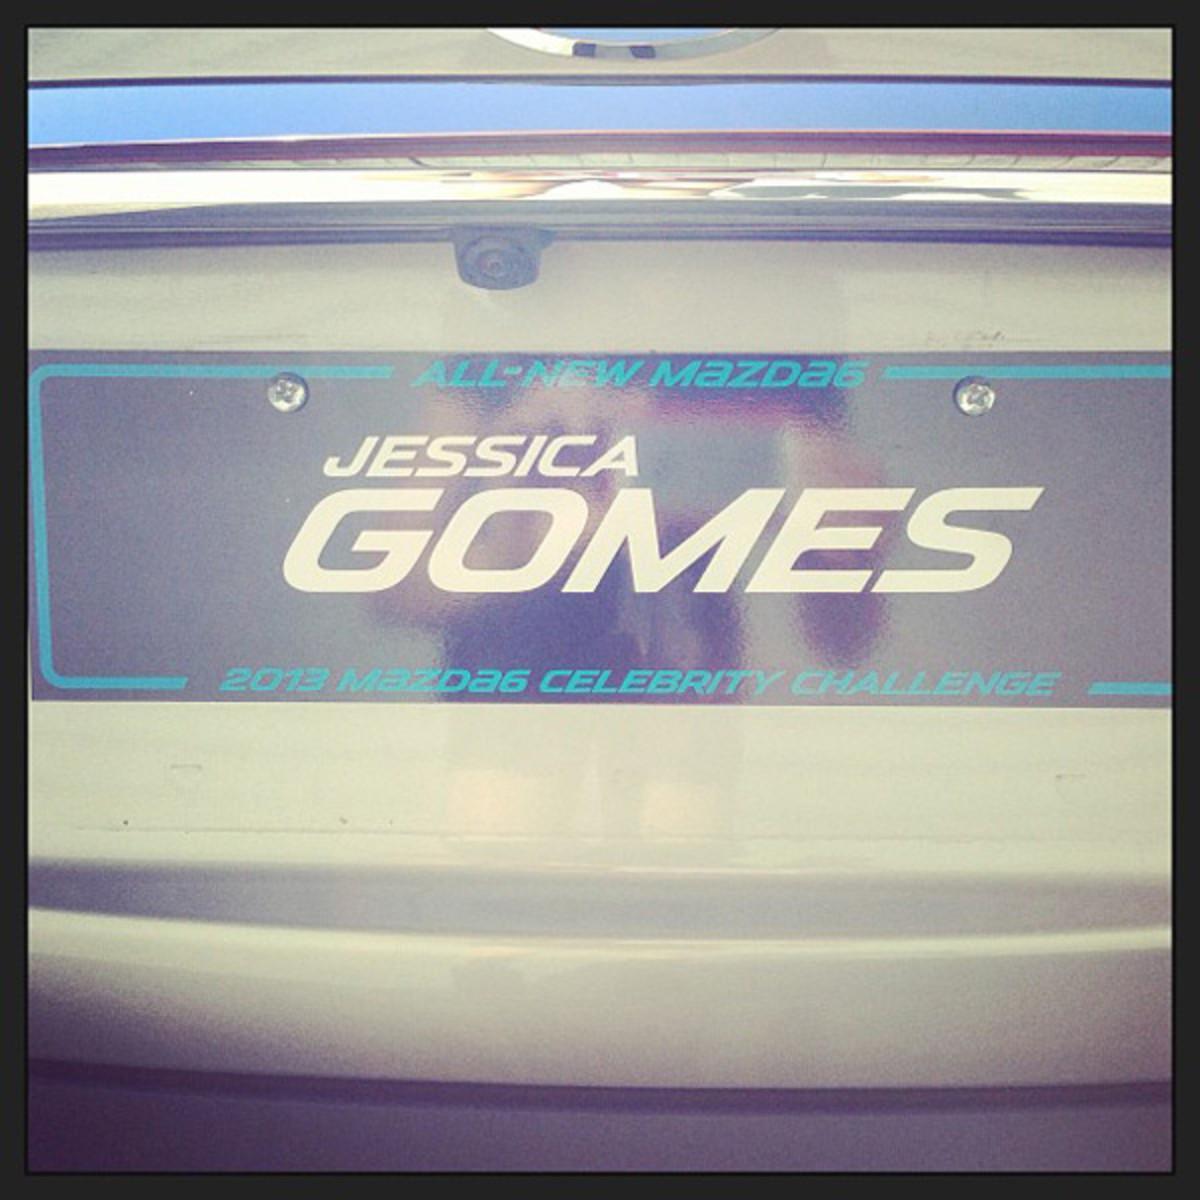 gomes-car65.jpg